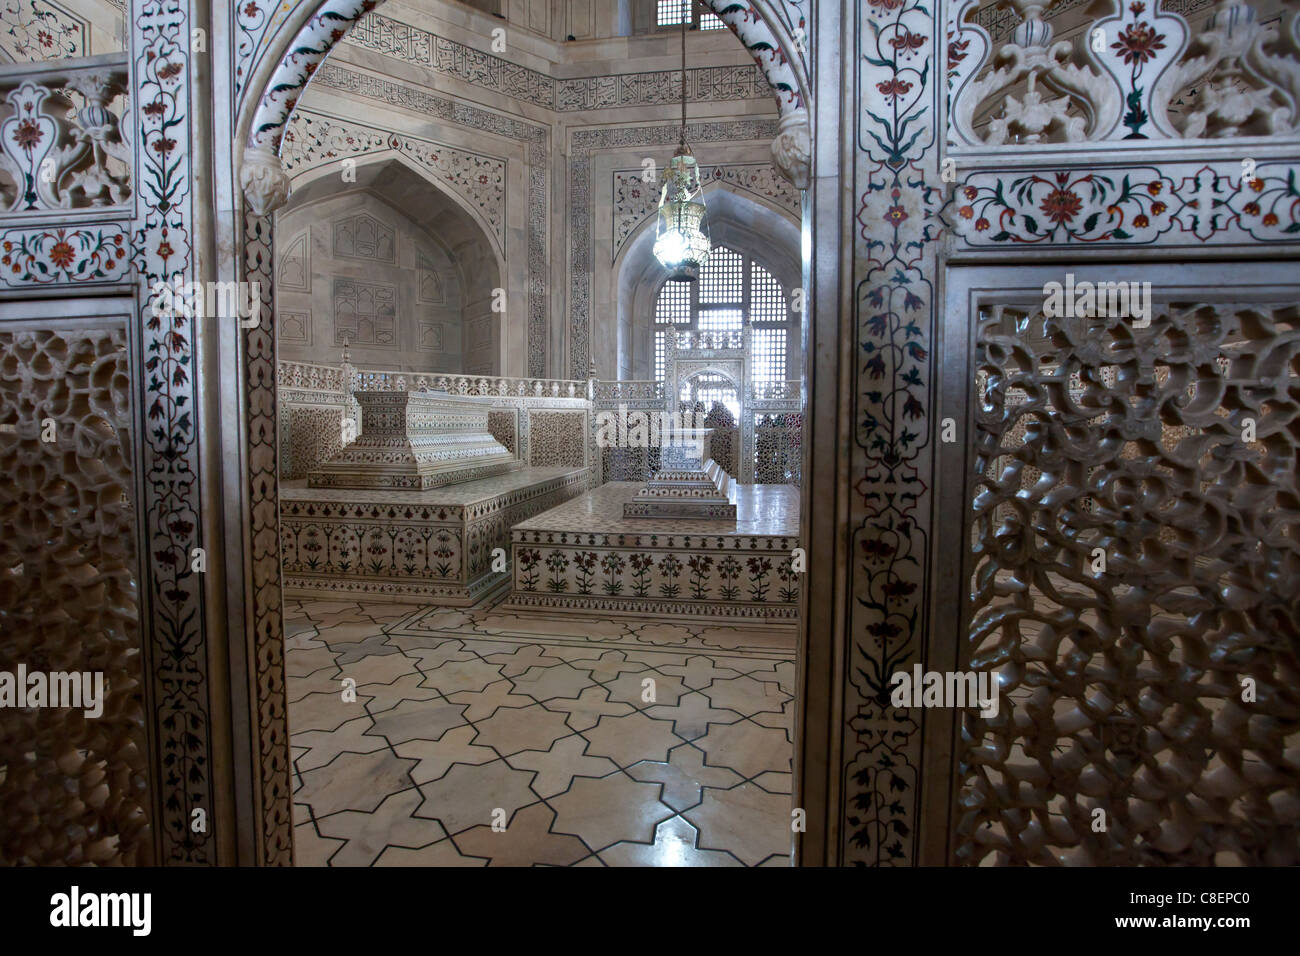 The Taj Mahal Mausoleum Marble Tomb Caskets Of Shah Jahan